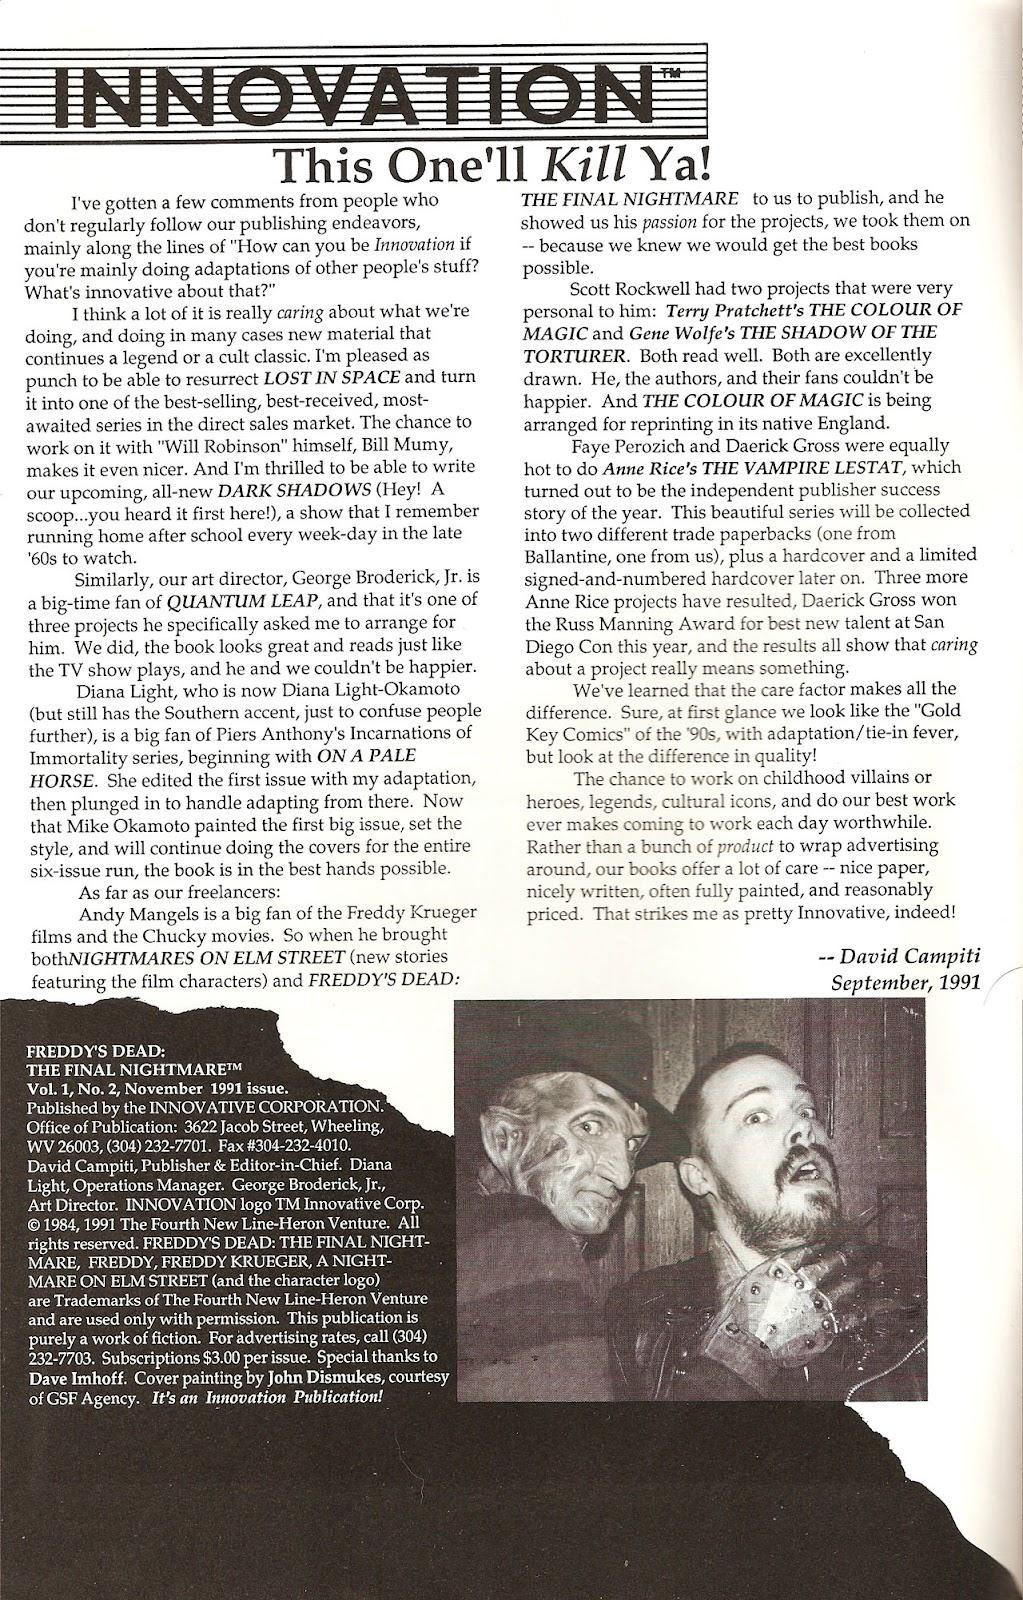 Read online Freddy's Dead: The Final Nightmare comic -  Issue #2 - 2